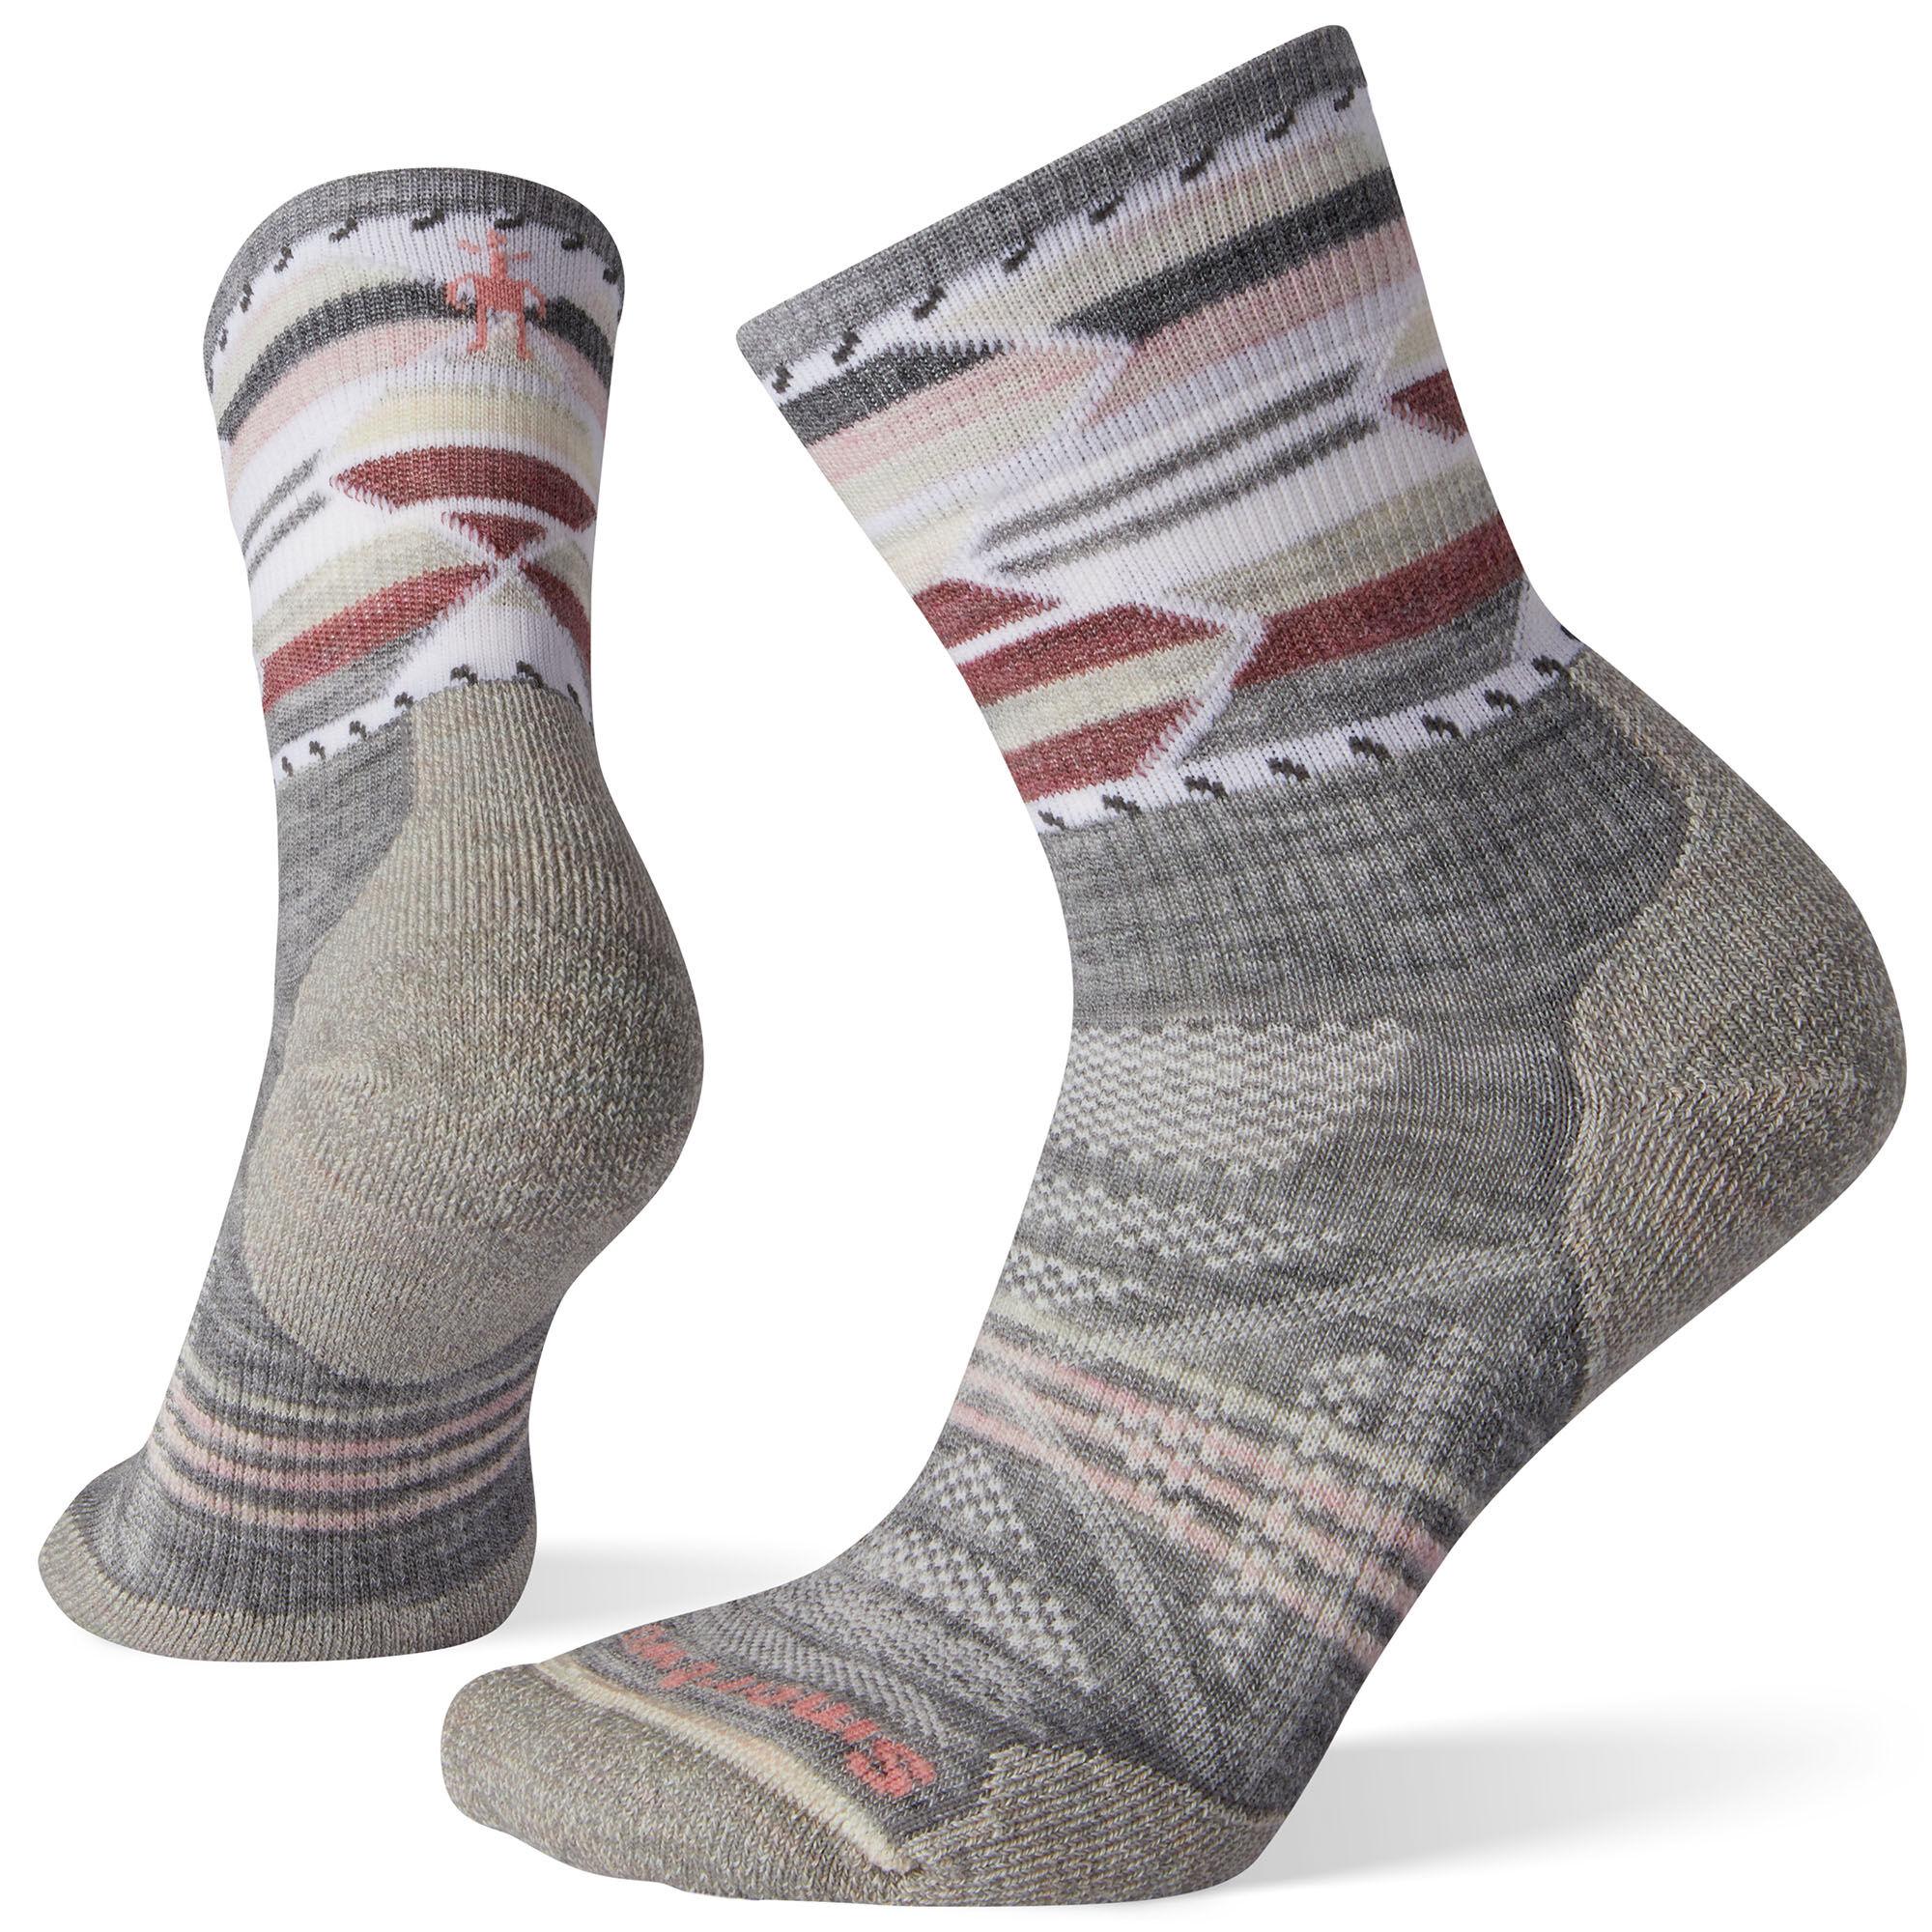 Smartwool Women's PhD Outdoor Light Pattern Mid Crew Hiking Socks  - Light Gray - Size: Medium